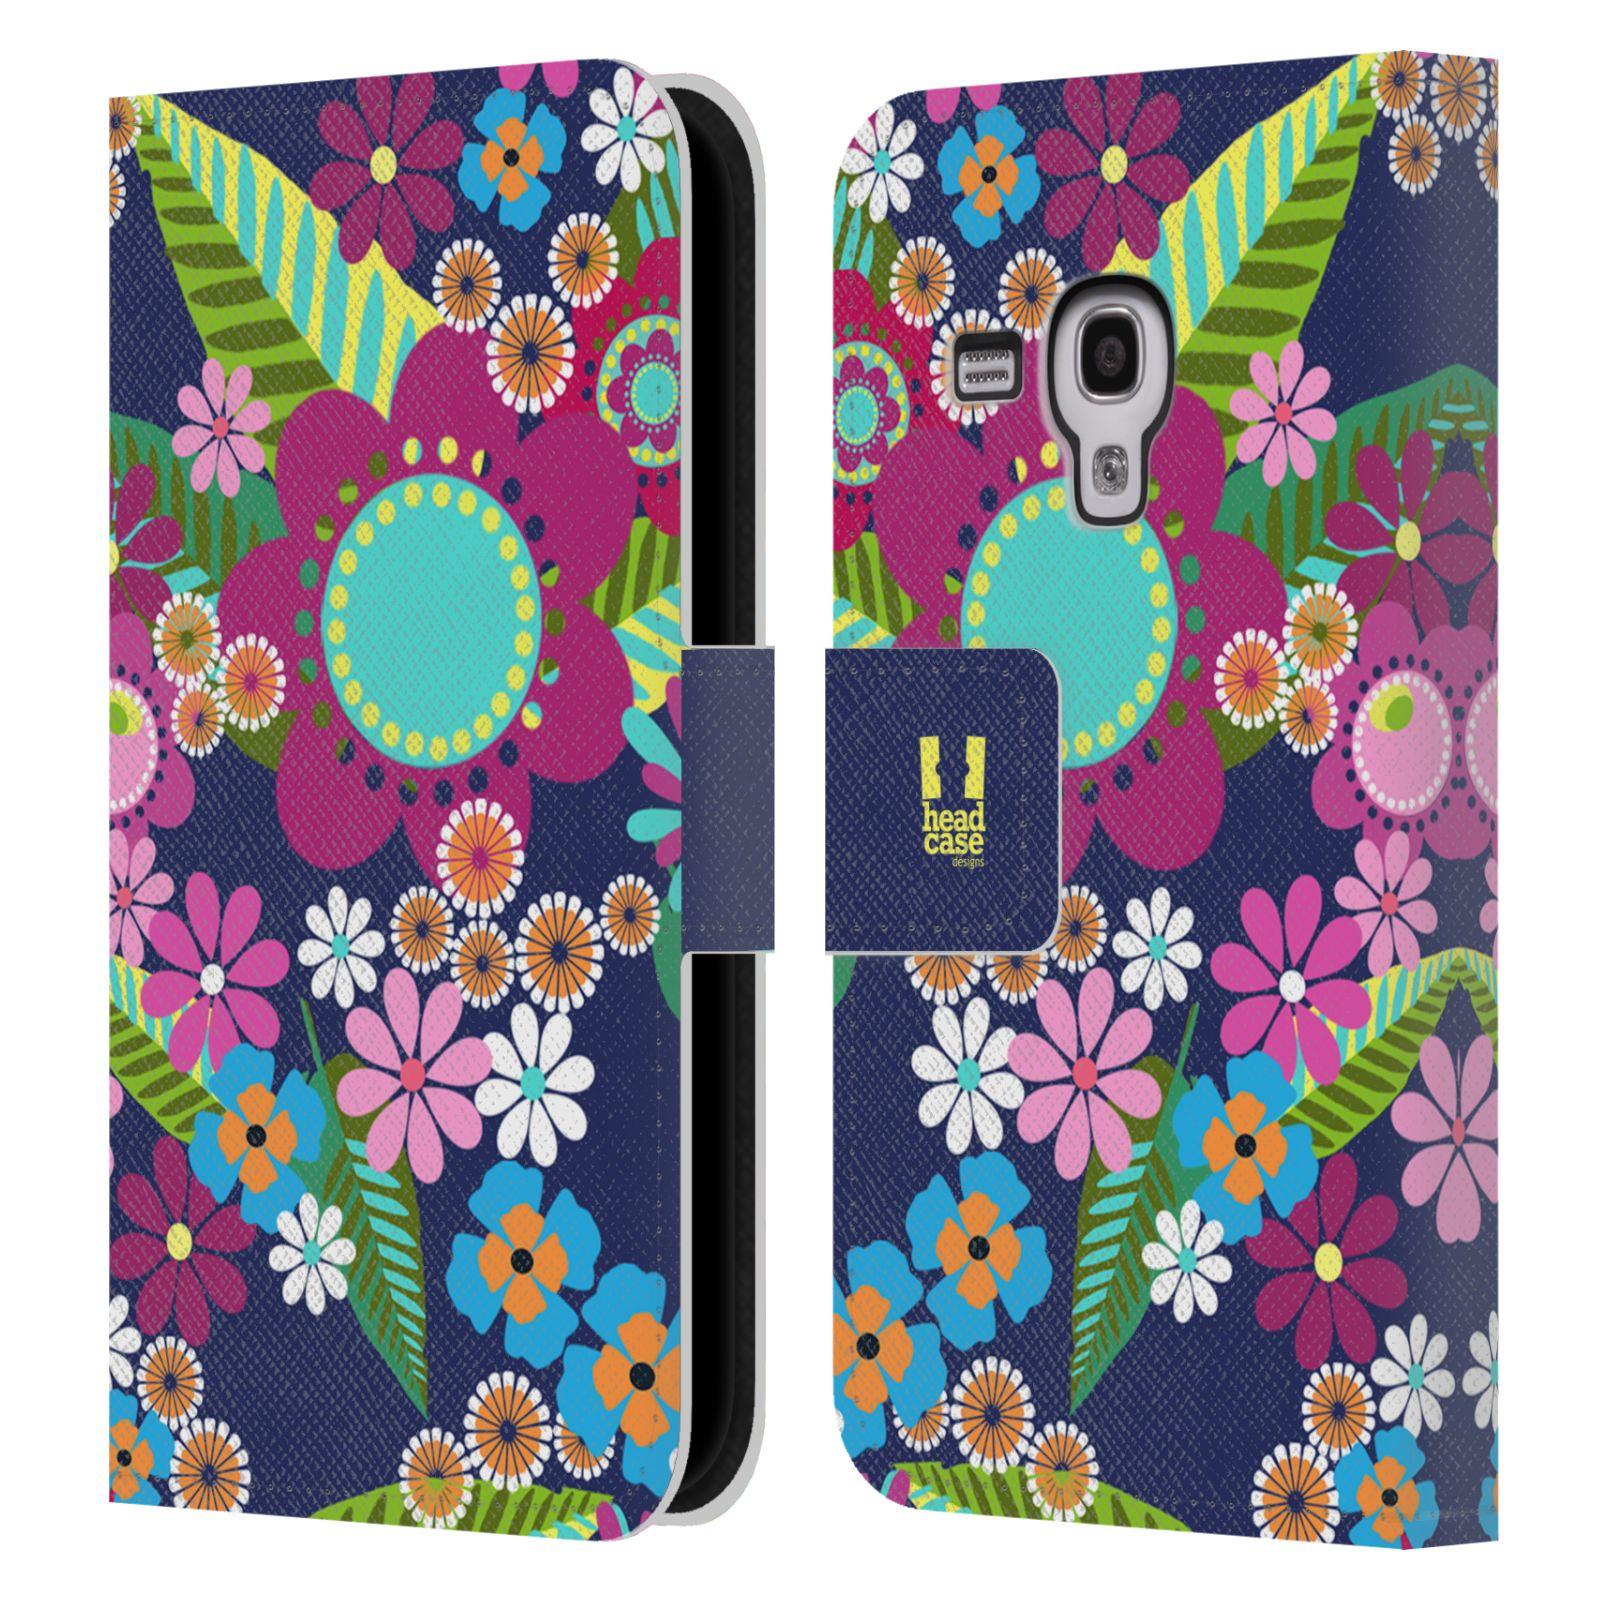 HEAD CASE Flipové pouzdro pro mobil Samsung Galaxy S3 MINI BOTANIKA barevné květy modrá